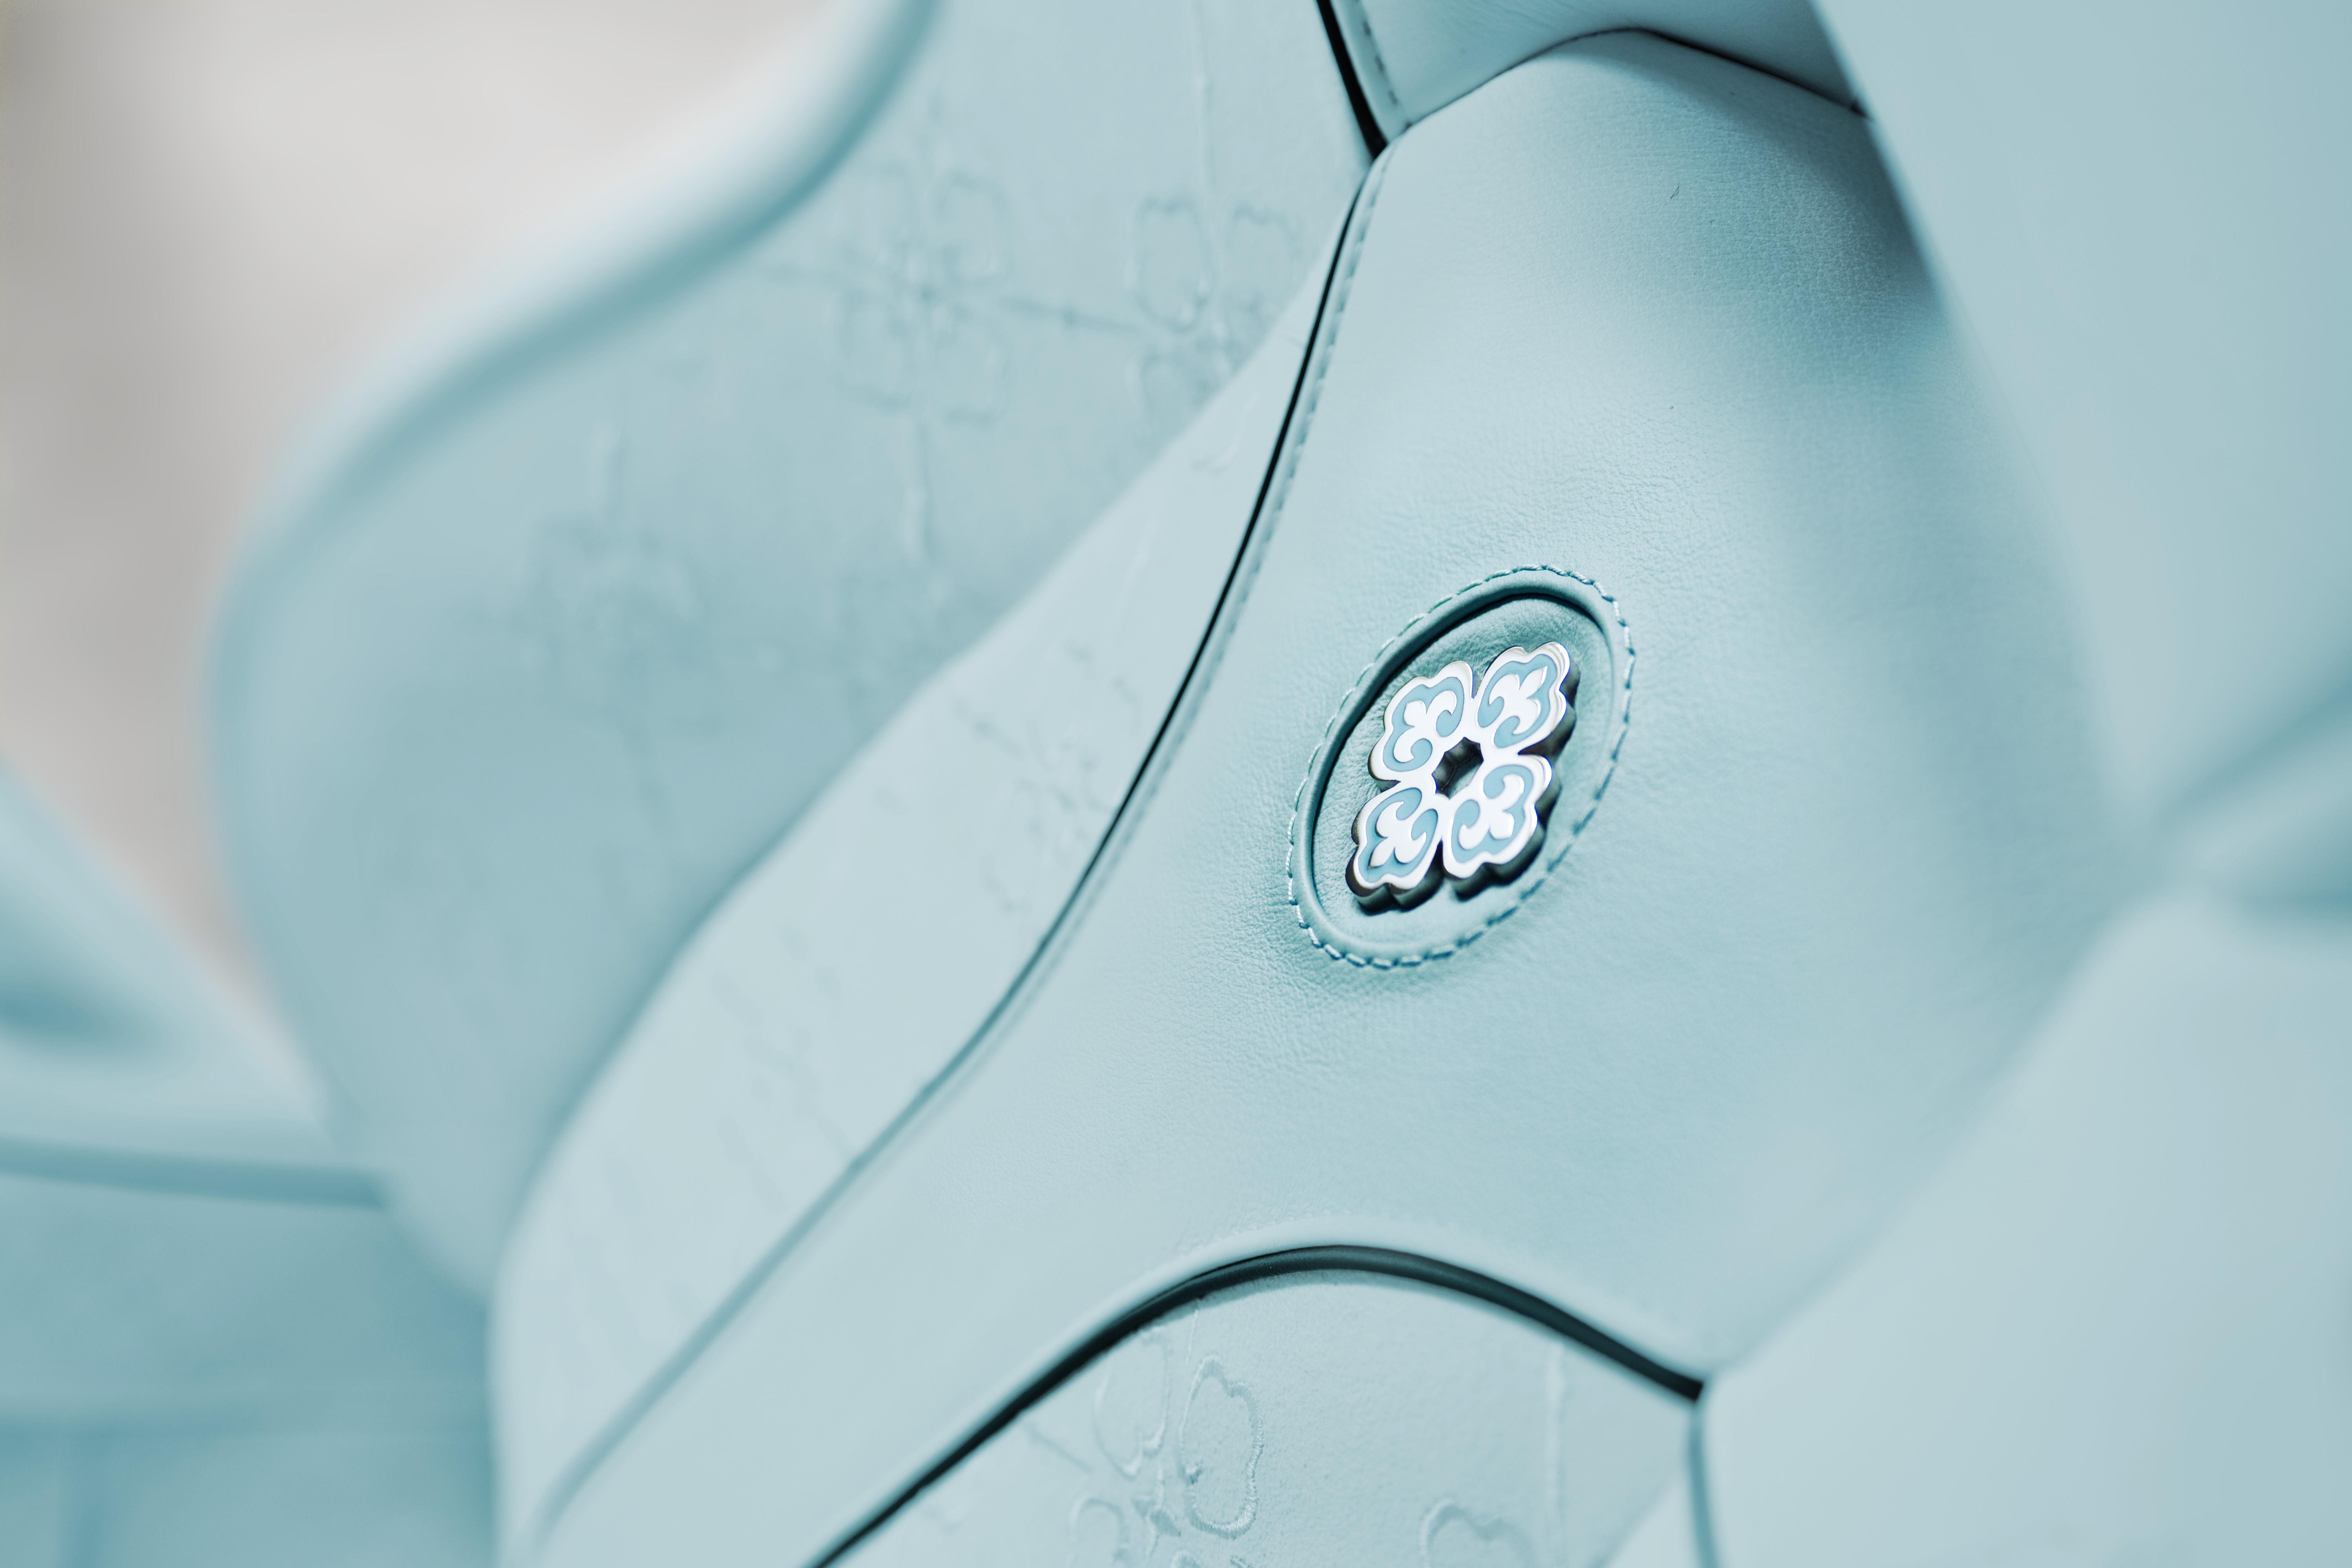 variata Dorit Lang GmbH & Co. KG